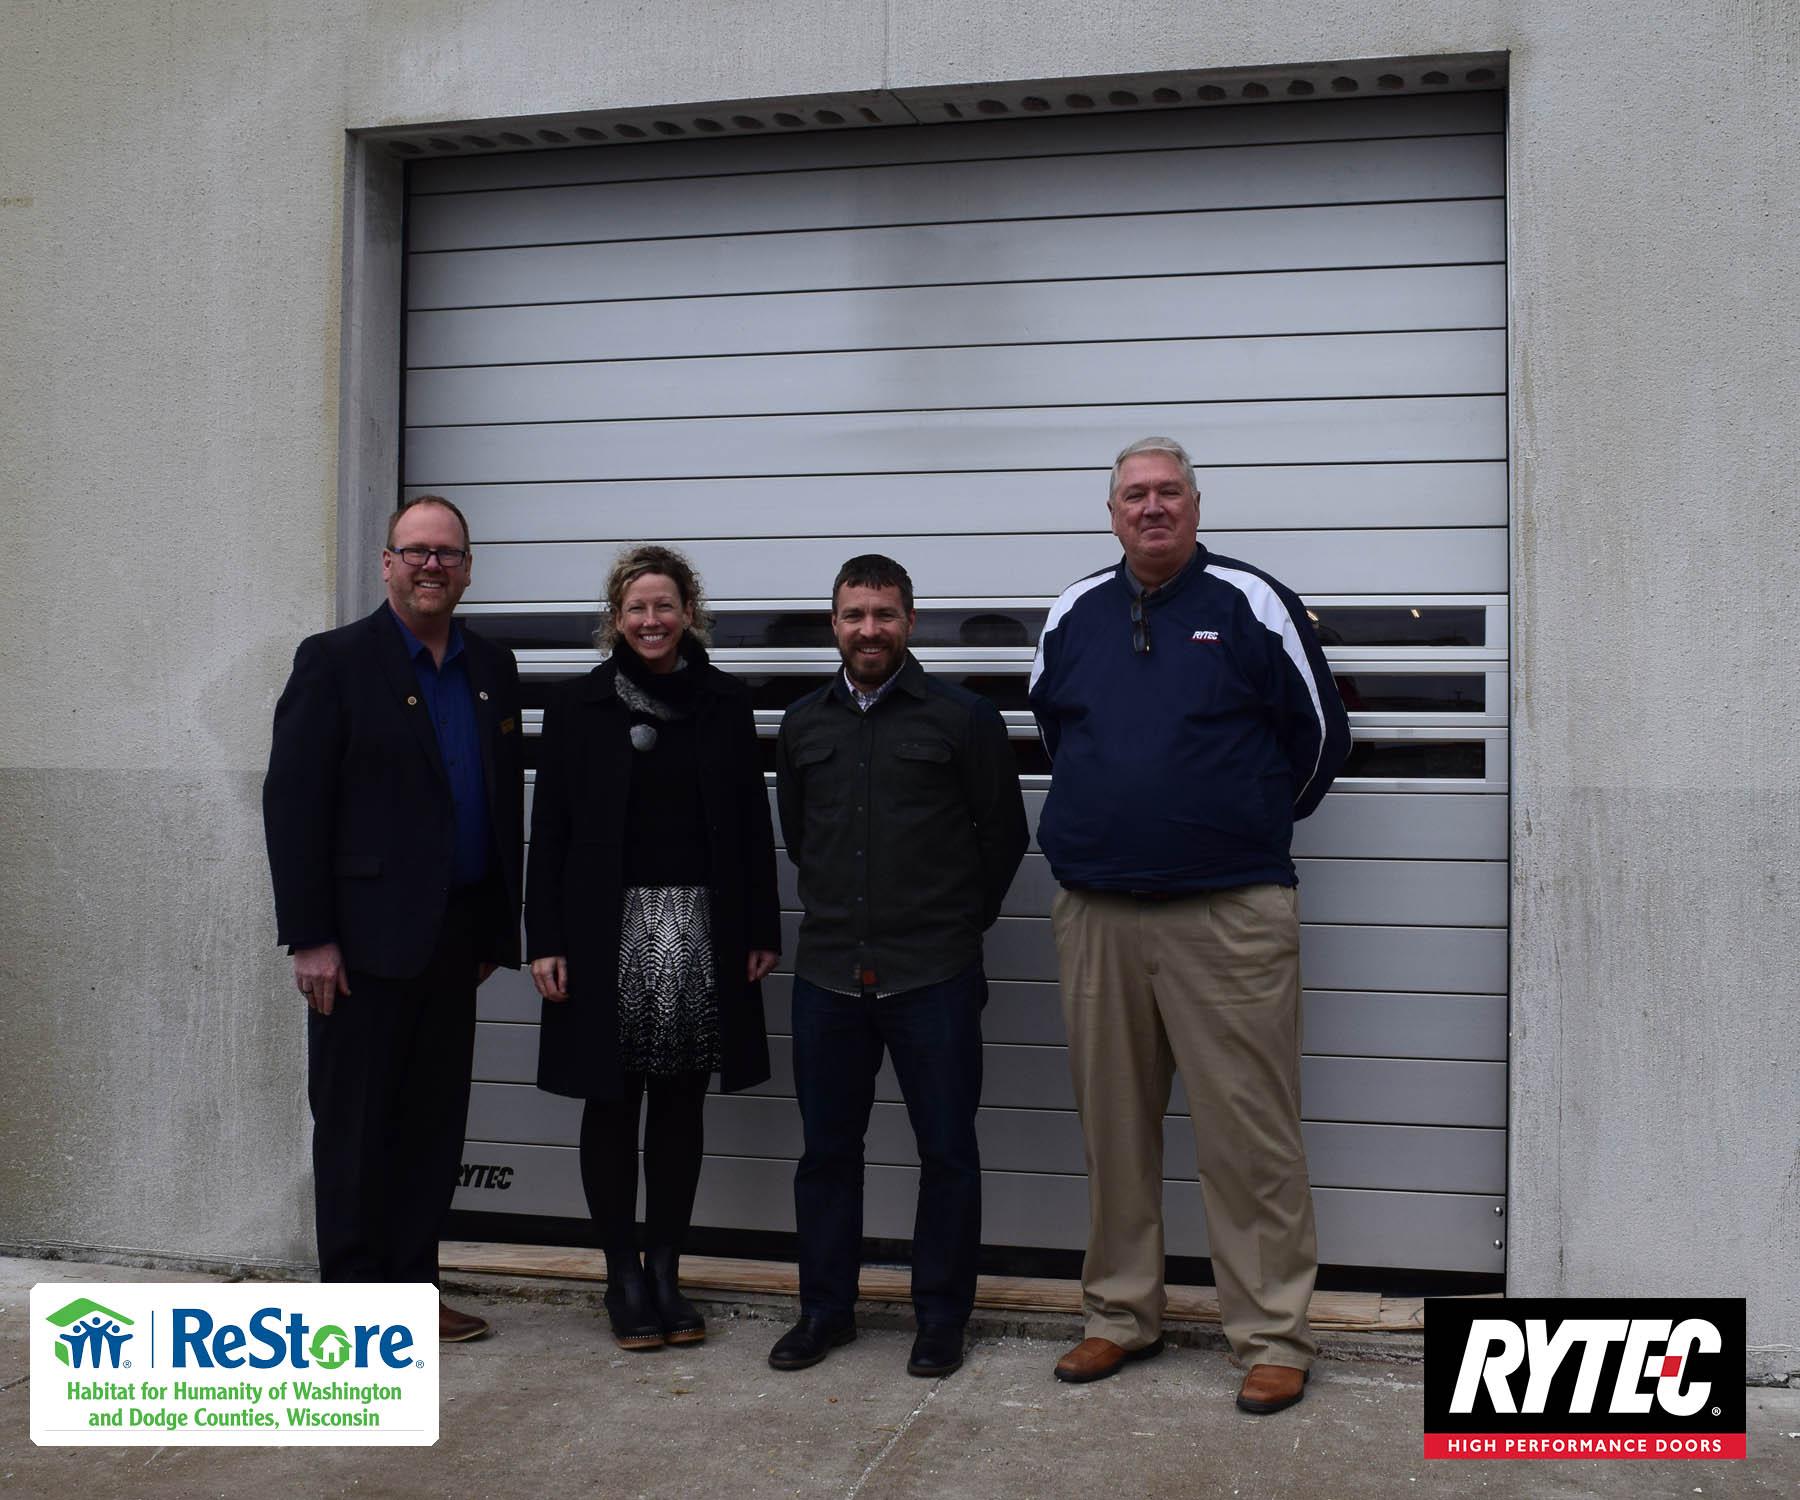 Rytec Restore Donation